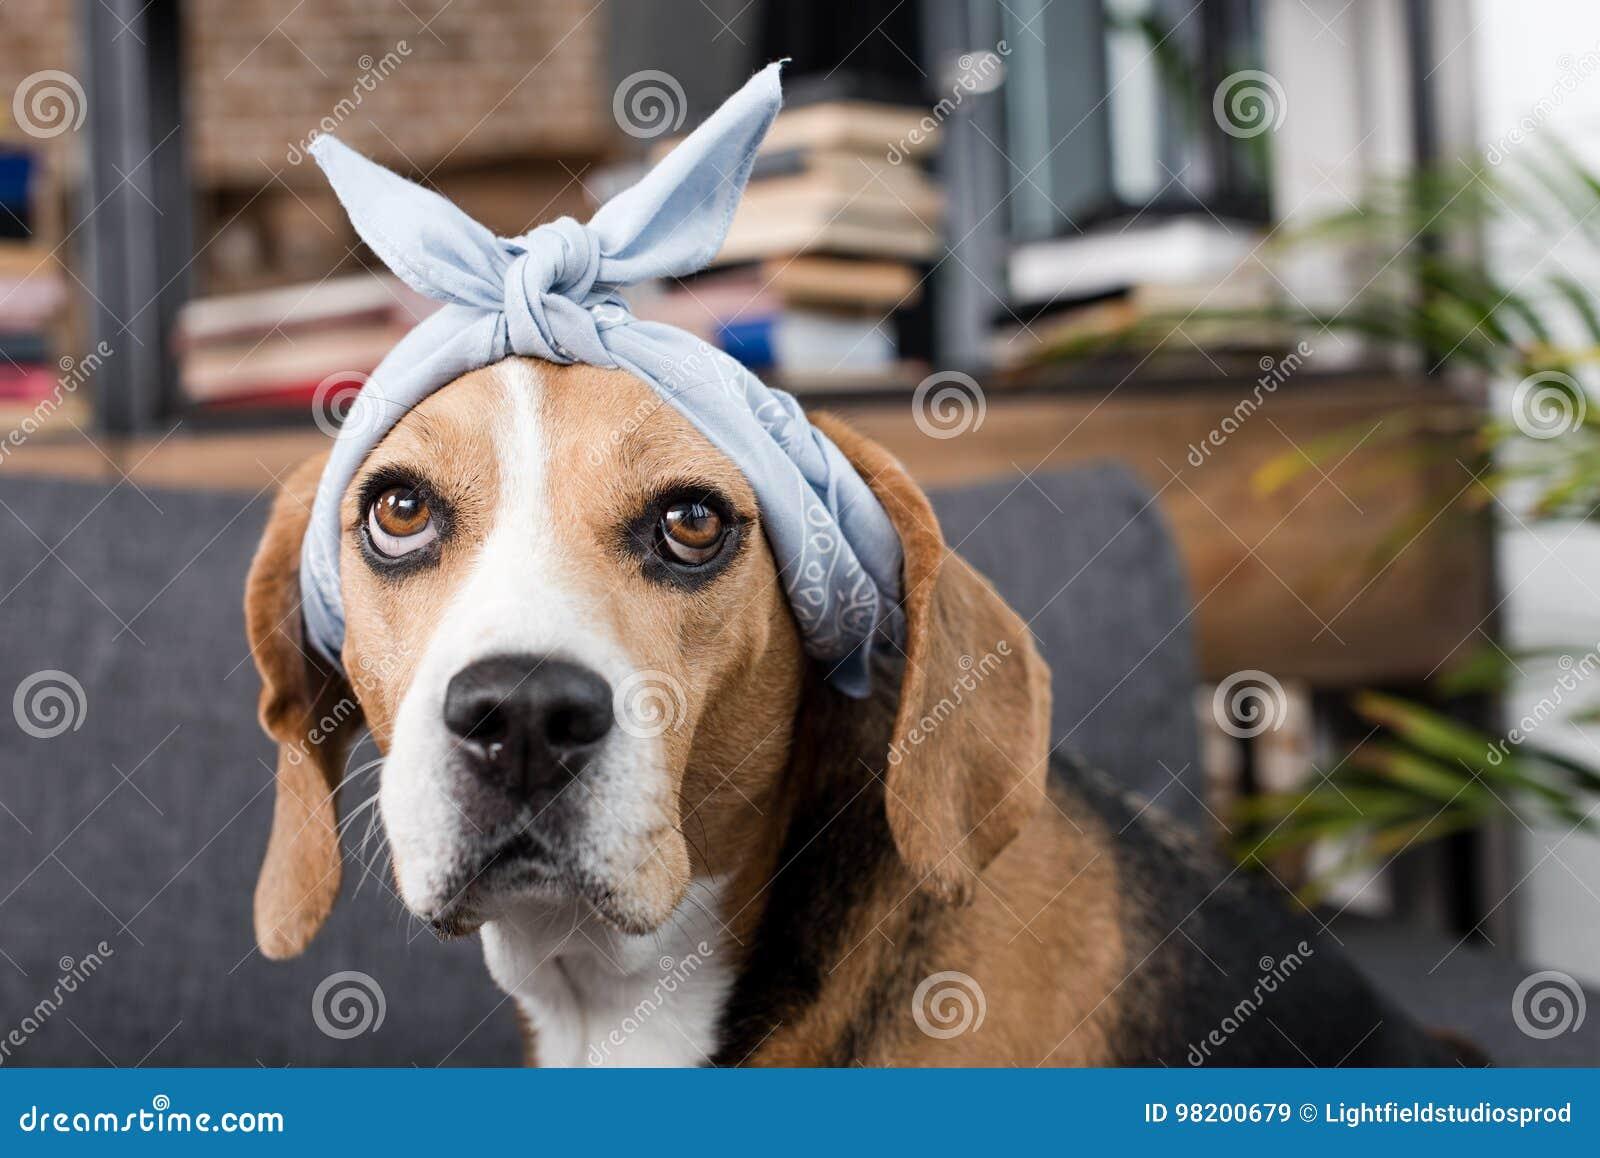 Download Собака бигля в сером Bandana сидя дома Стоковое Изображение - изображение насчитывающей собач, собака: 98200679